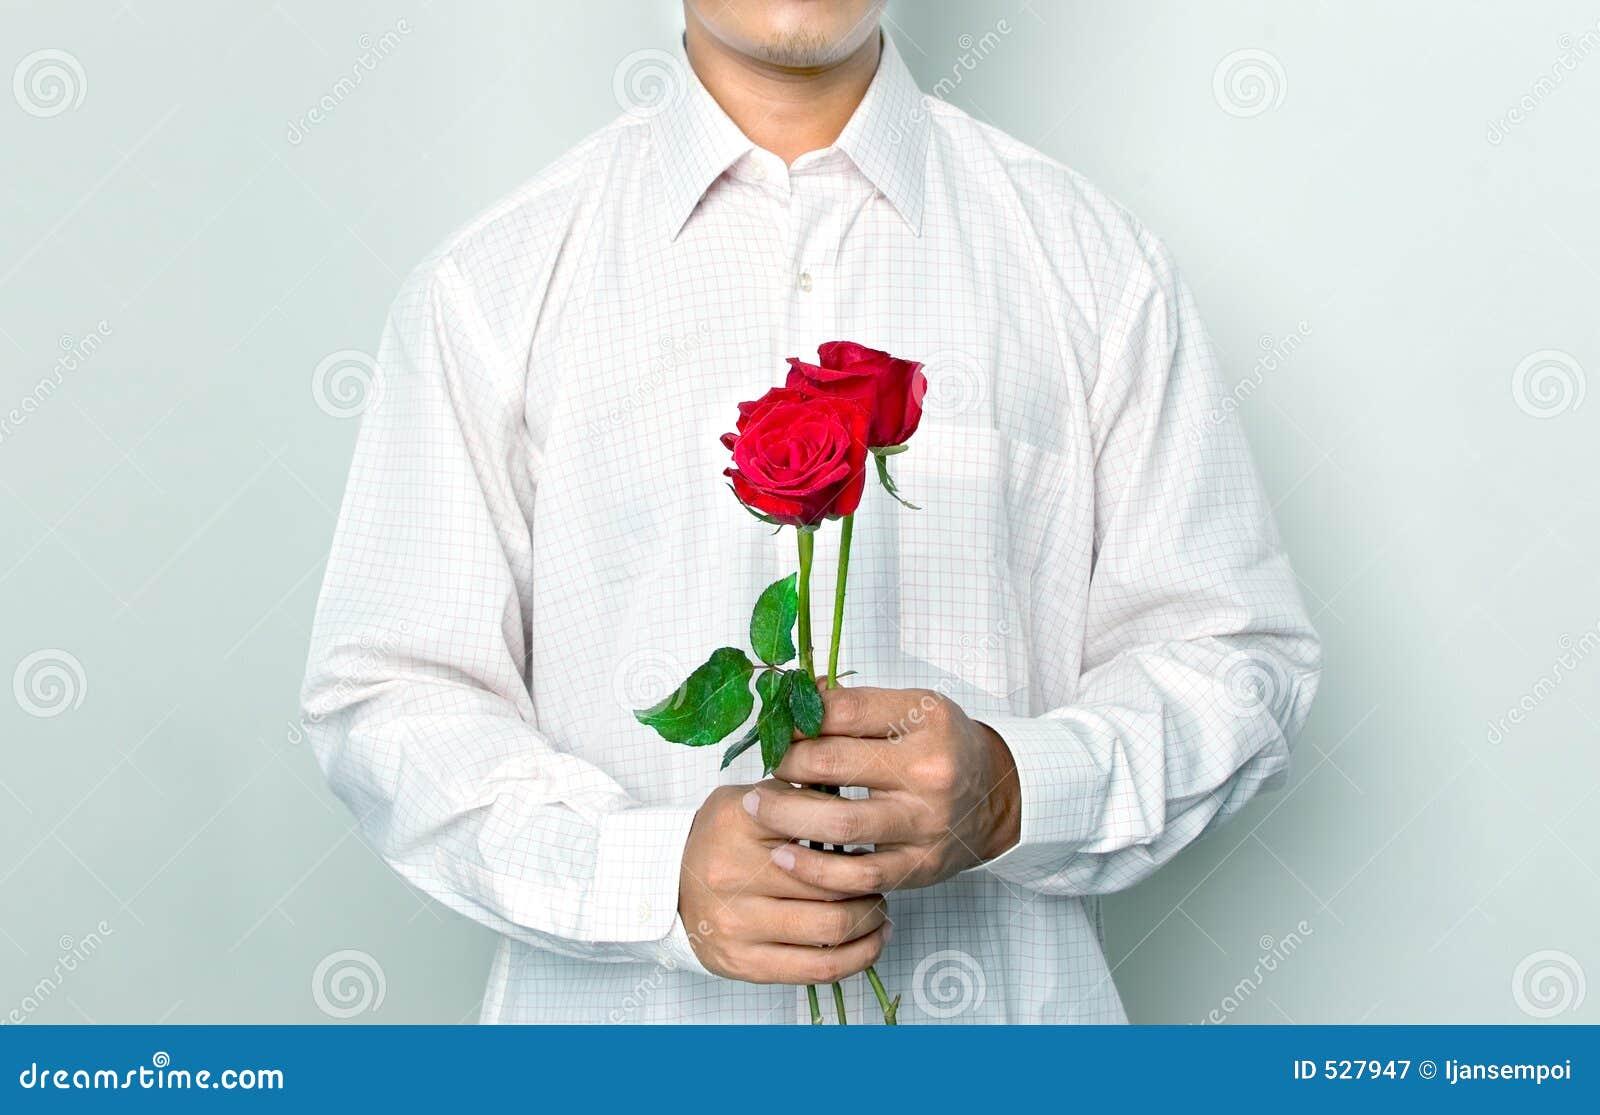 Download 藏品人玫瑰 库存图片. 图片 包括有 绿色, 背包, 现有量, 上升了, 浪漫, 婚姻, 锋利, 感觉, 特殊 - 527947